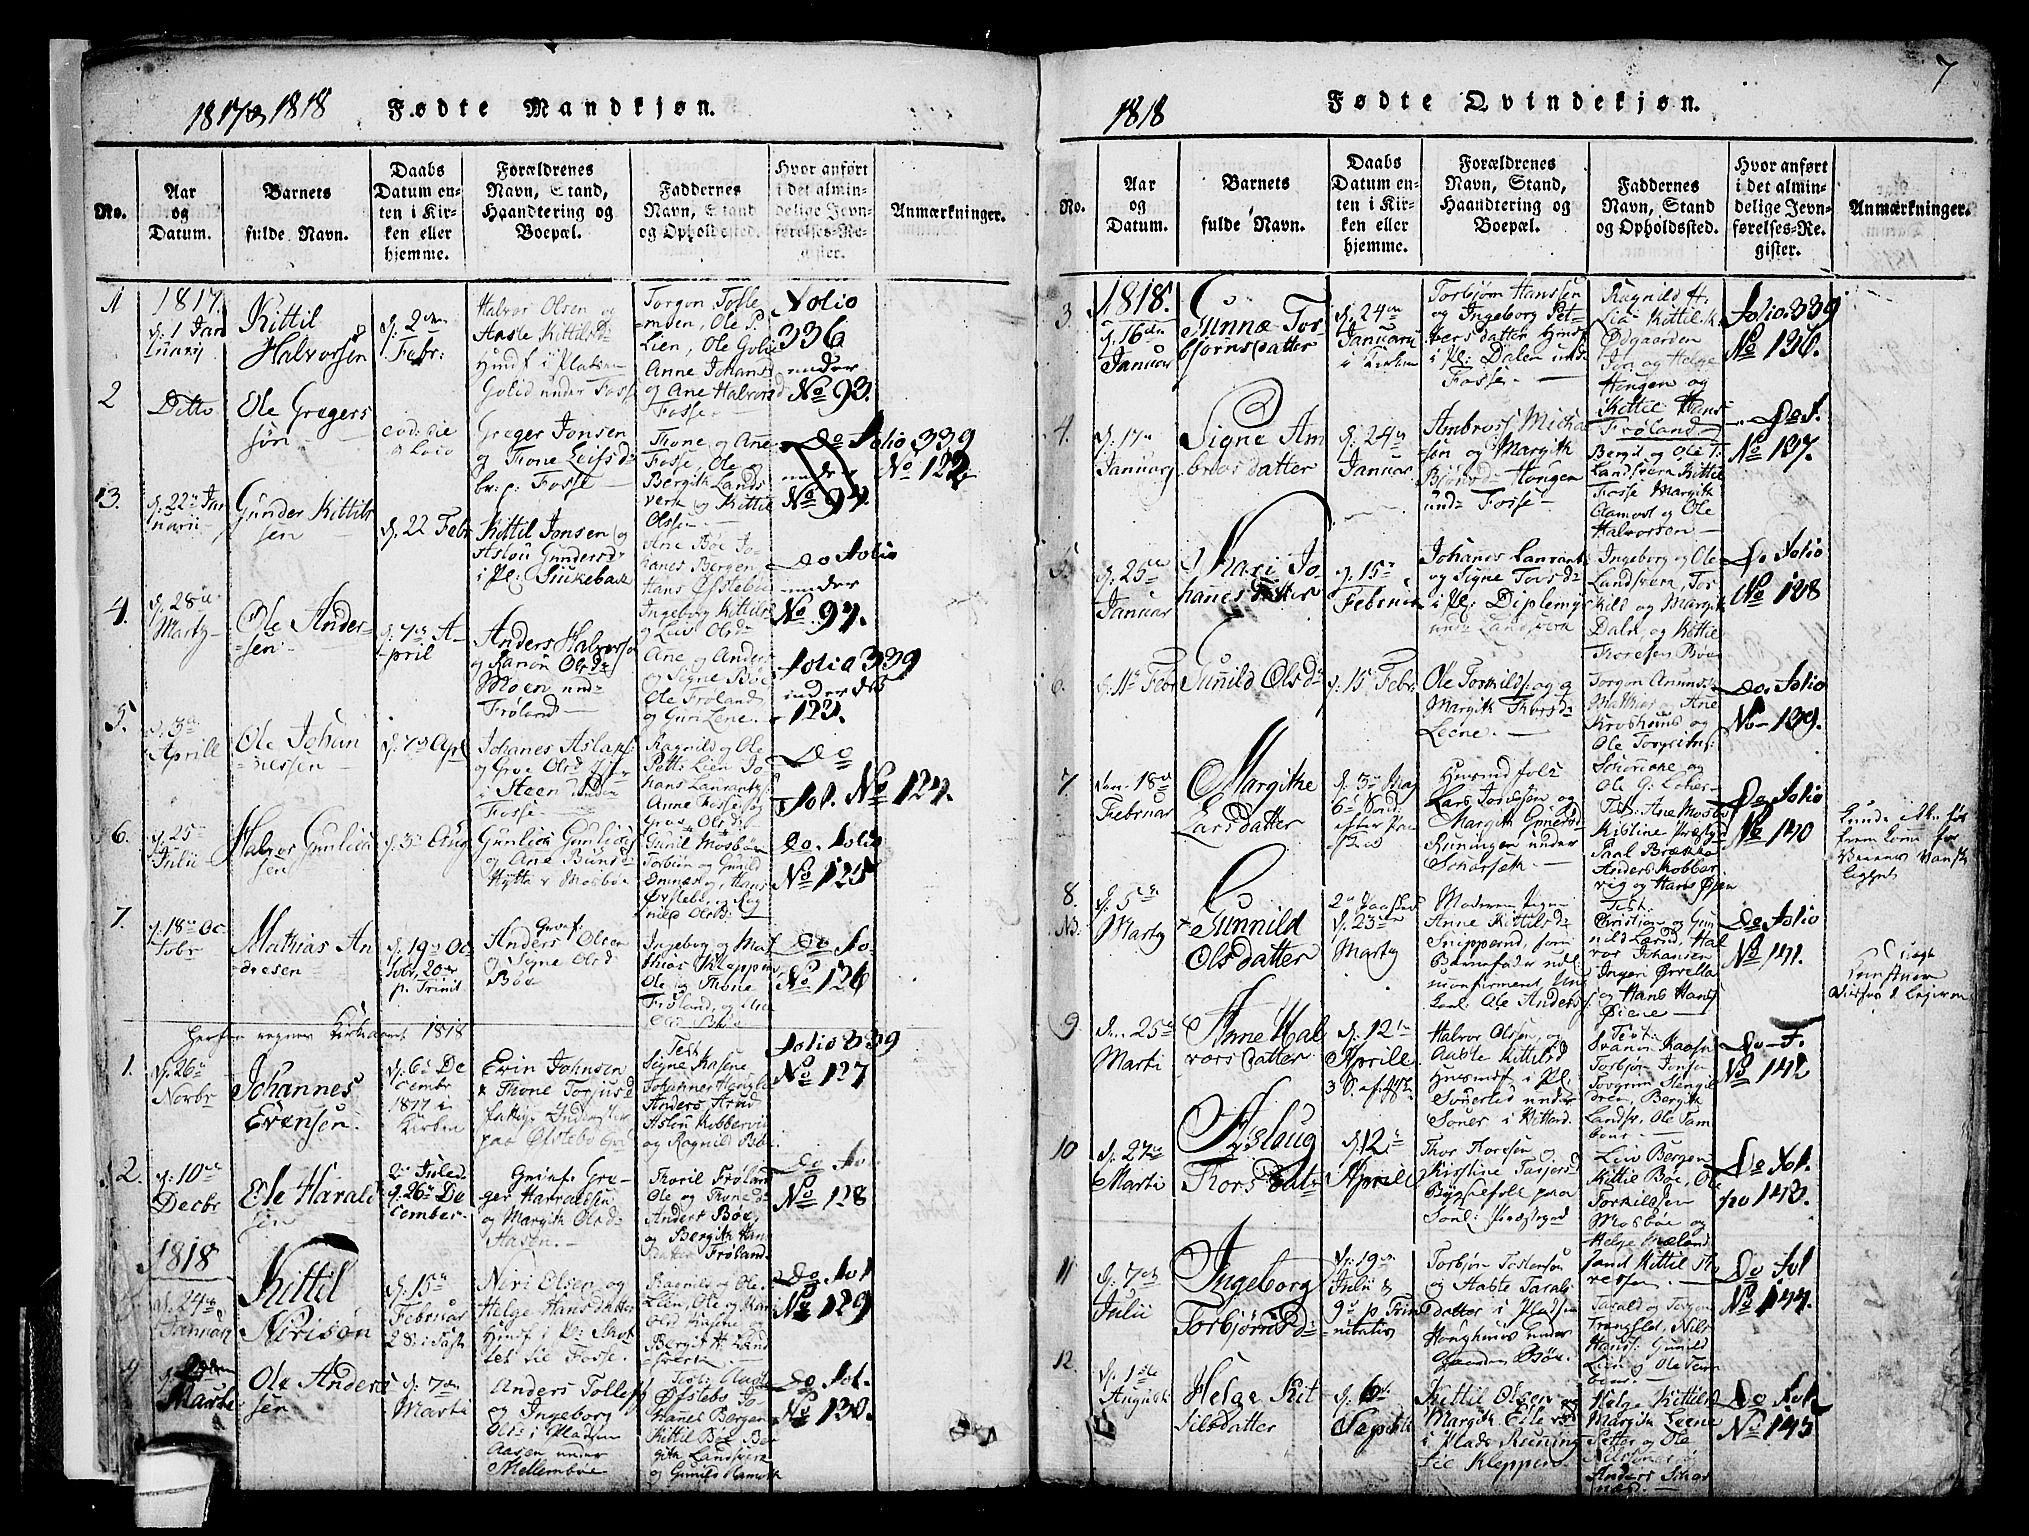 SAKO, Hjartdal kirkebøker, F/Fb/L0001: Ministerialbok nr. II 1, 1815-1843, s. 7